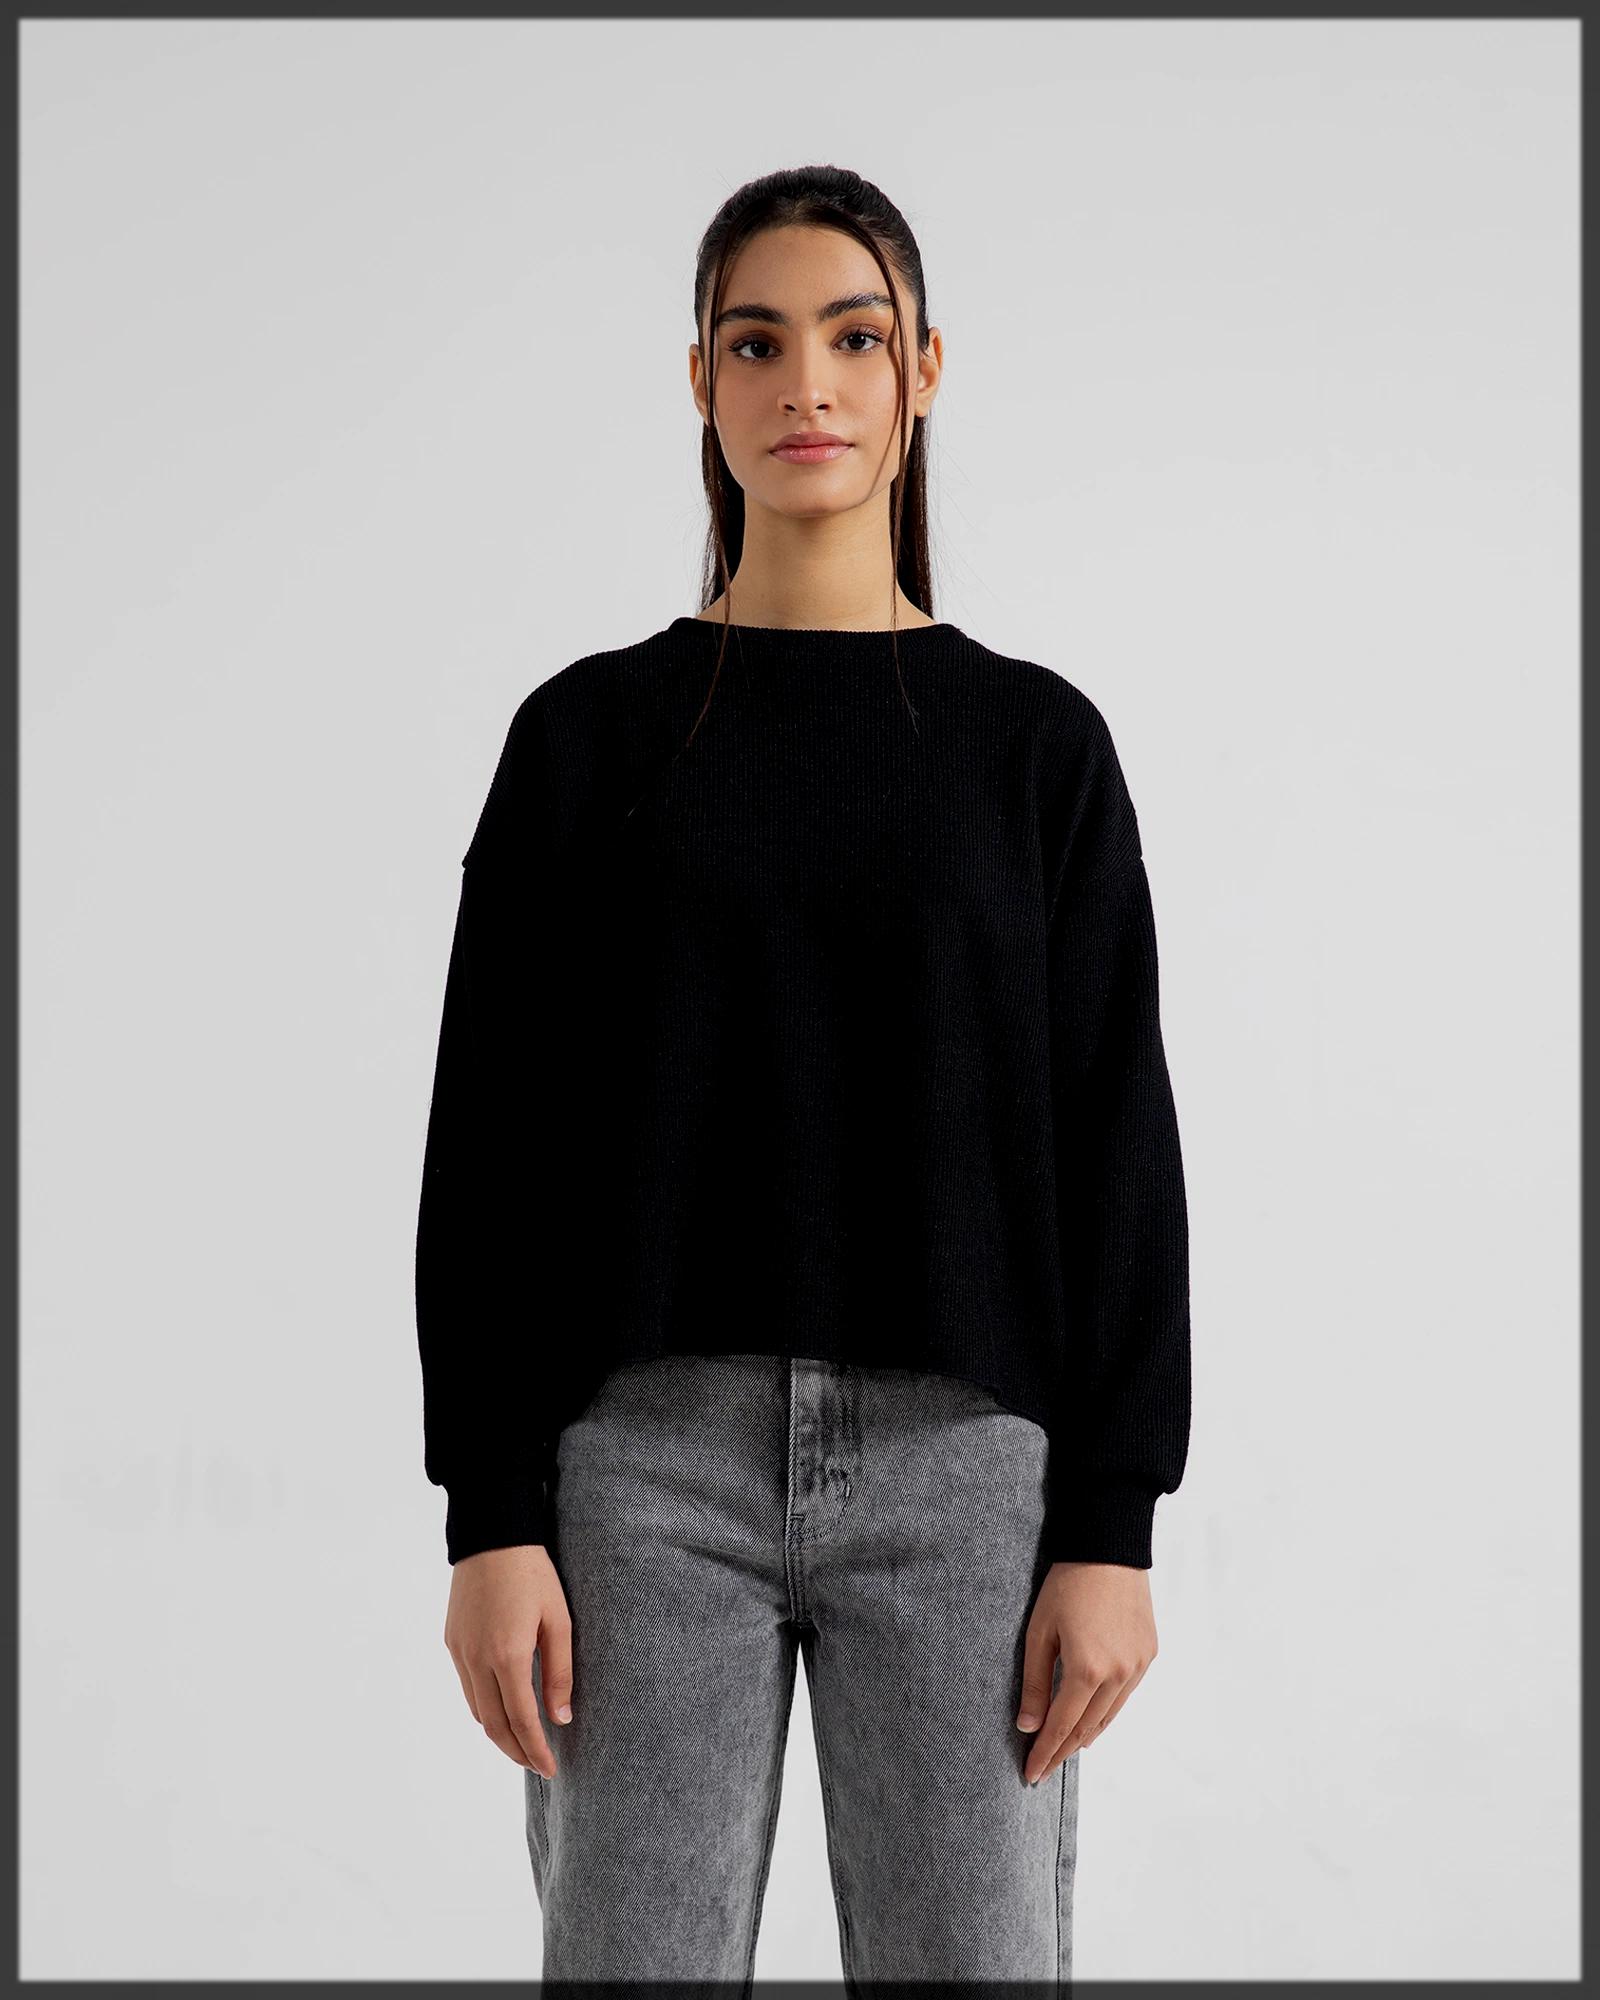 sleek black winter sweatshirt